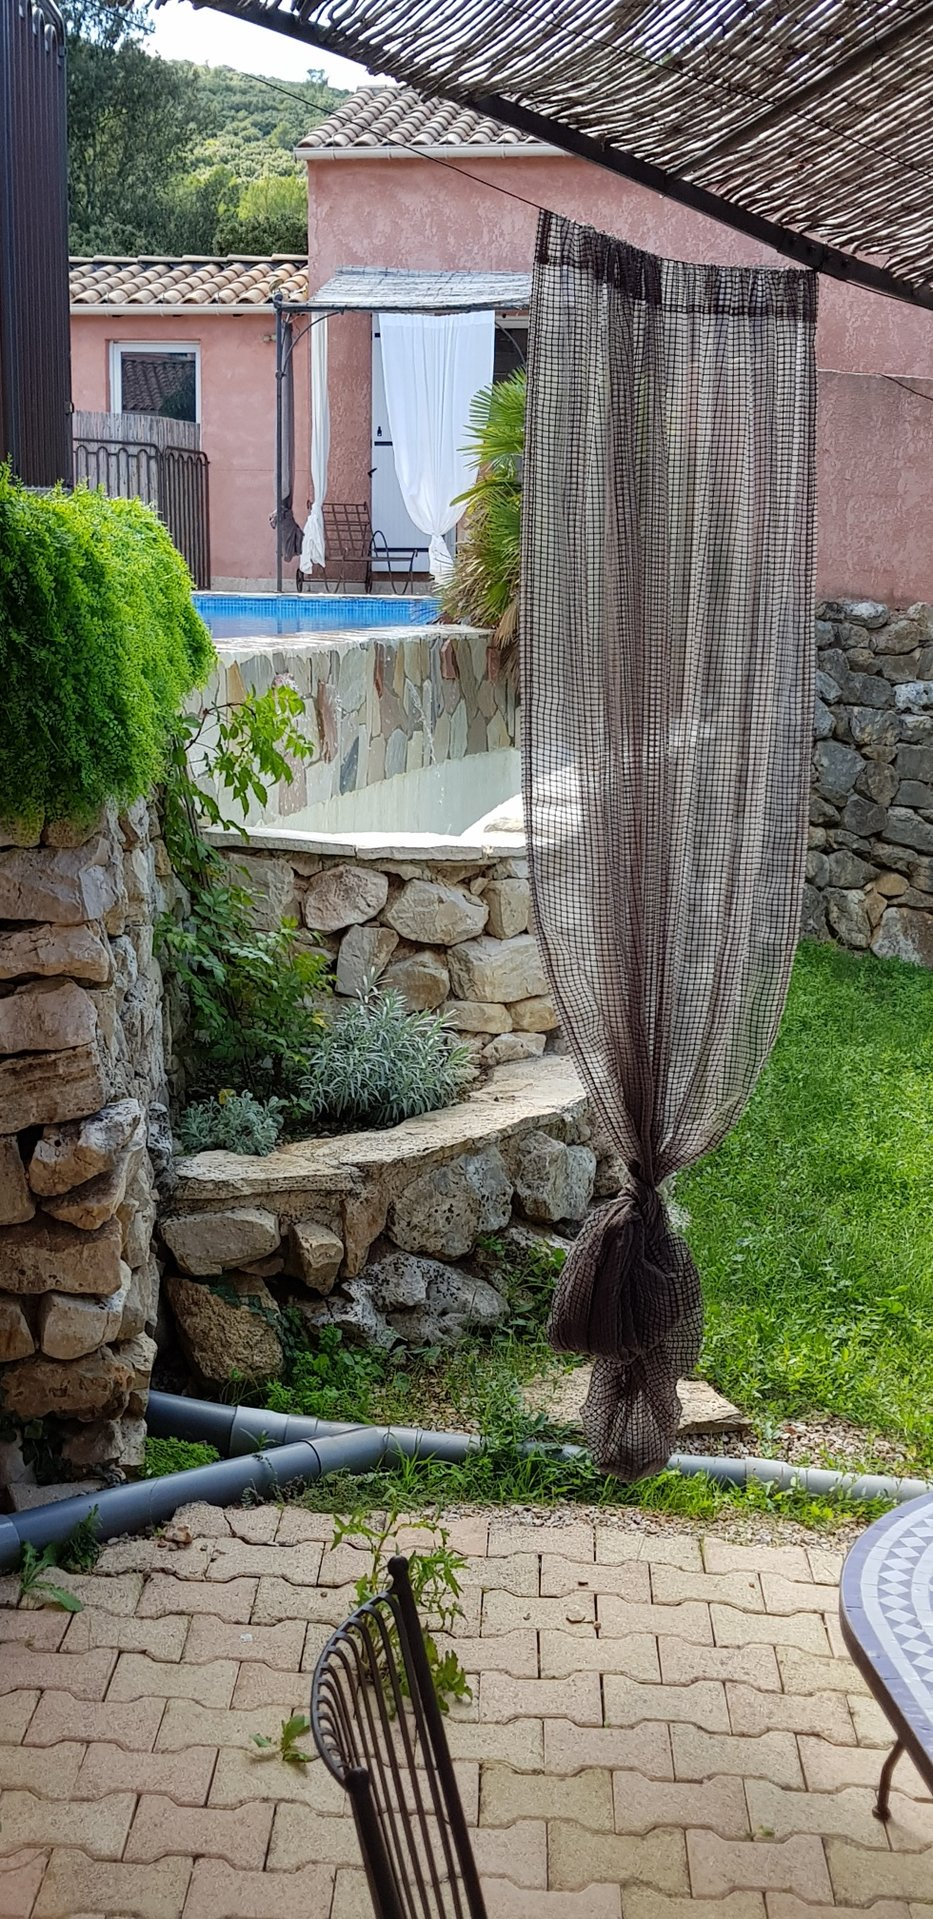 NEOULES  PROPRIETE  VILLA + 7 GITES CHAMBRES D'HOTES